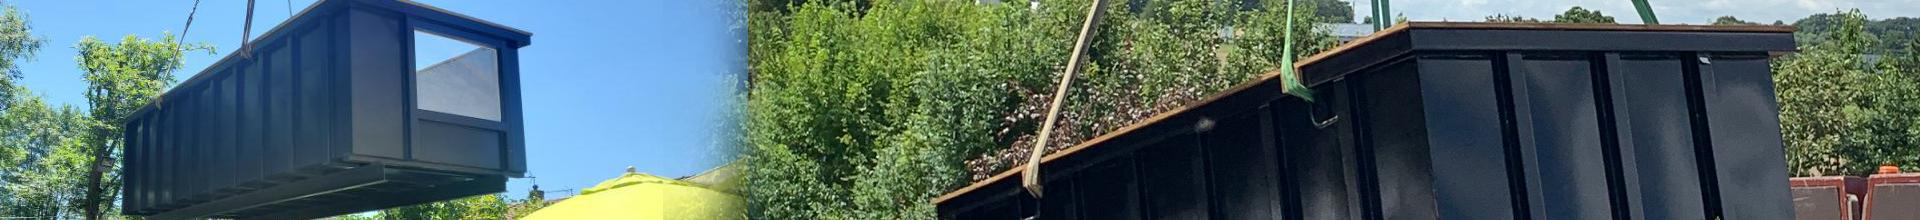 Projet container piscine sur mesure Belgique (Hasselt)